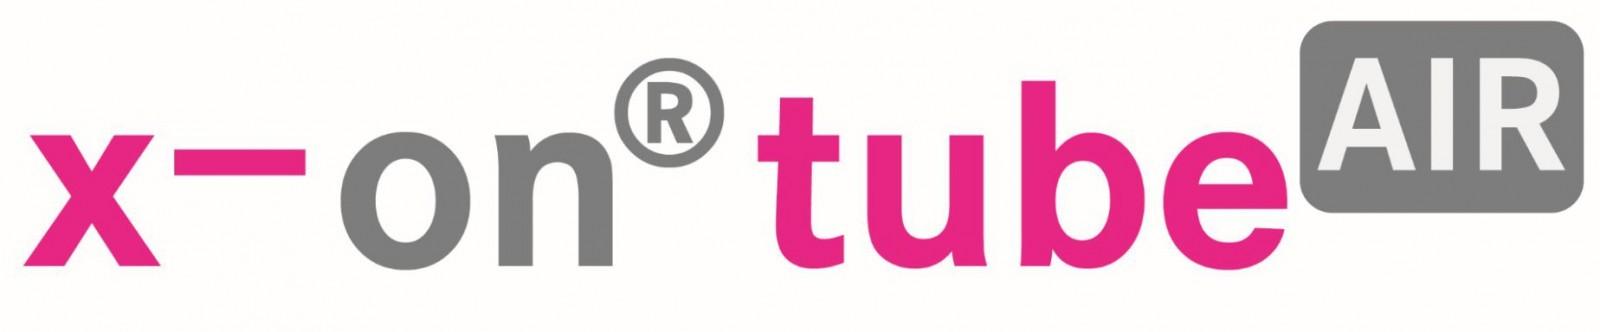 x-on tube air logo